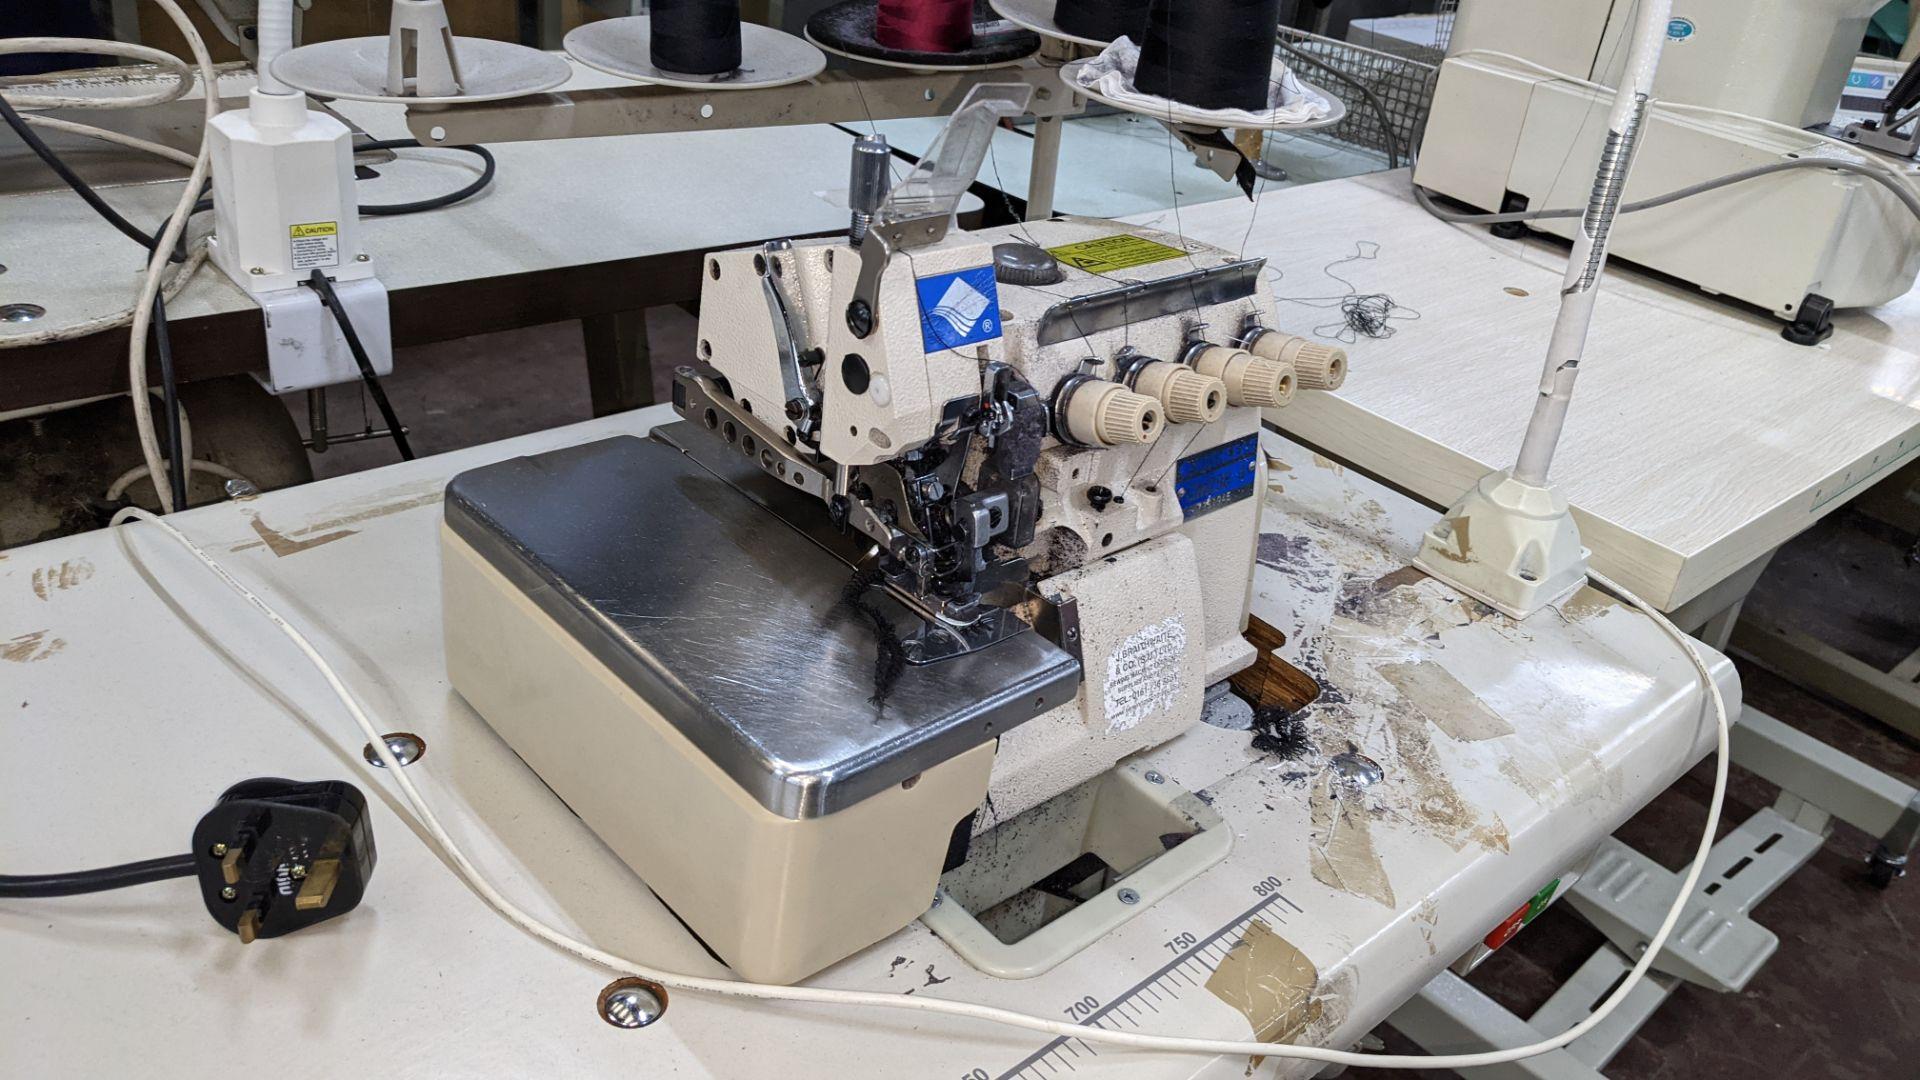 Highlead overlocker model GM288-4 - Image 7 of 16